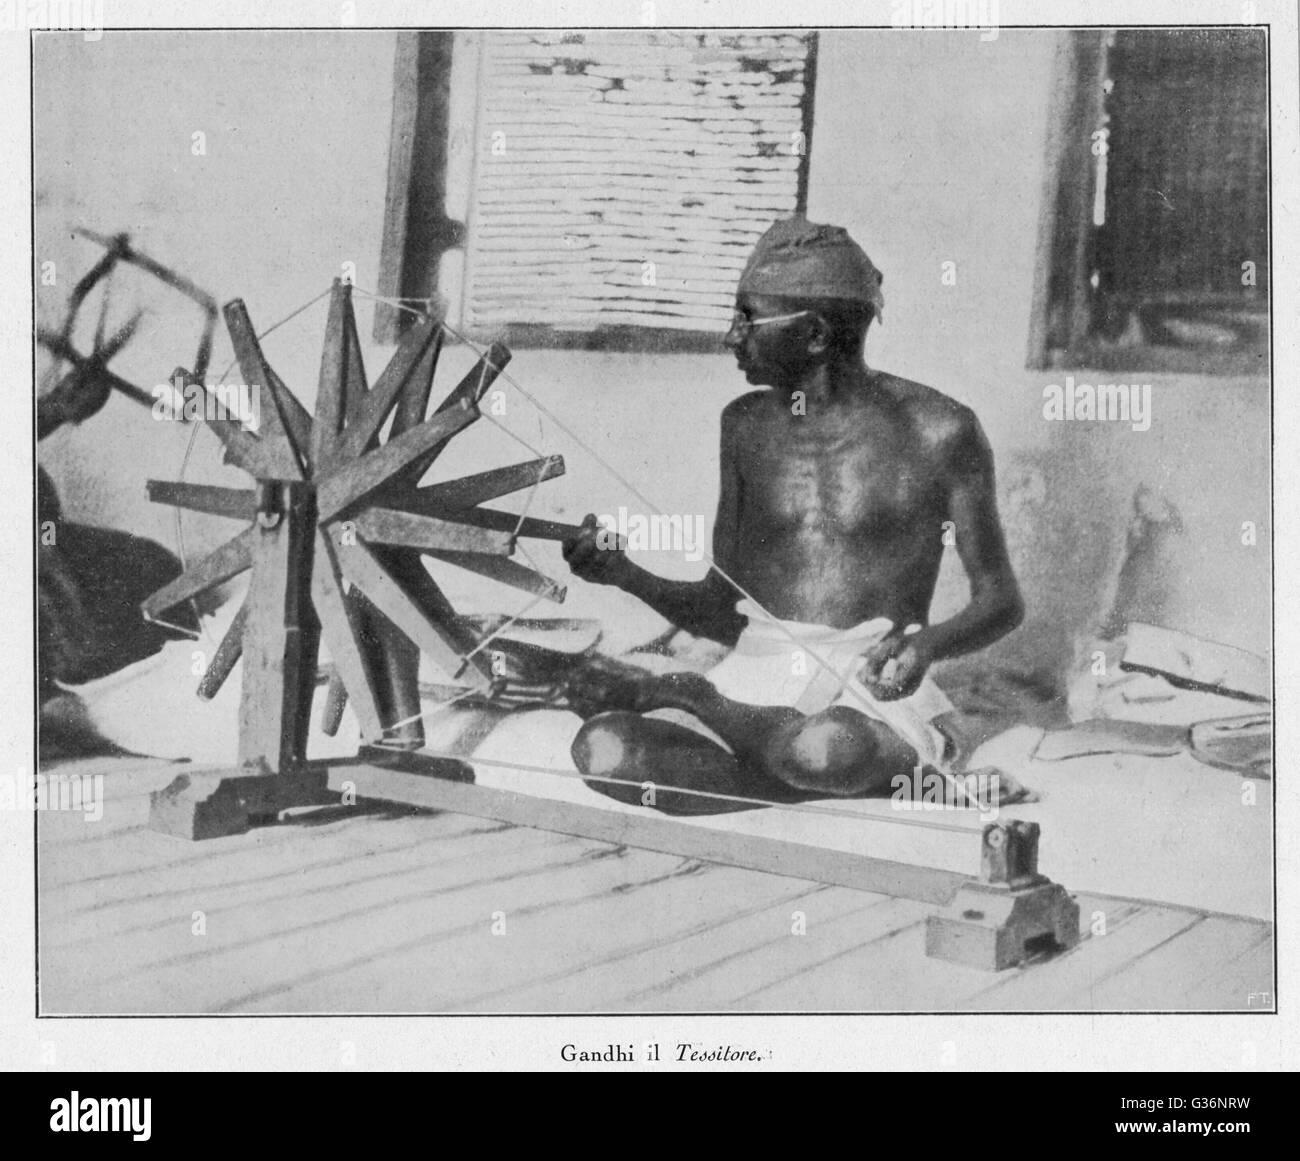 Mahatma Gandhi, Indian nationalist and spiritual leader, spinning at his wheel (Charakha) in 1931, demonstrating - Stock Image